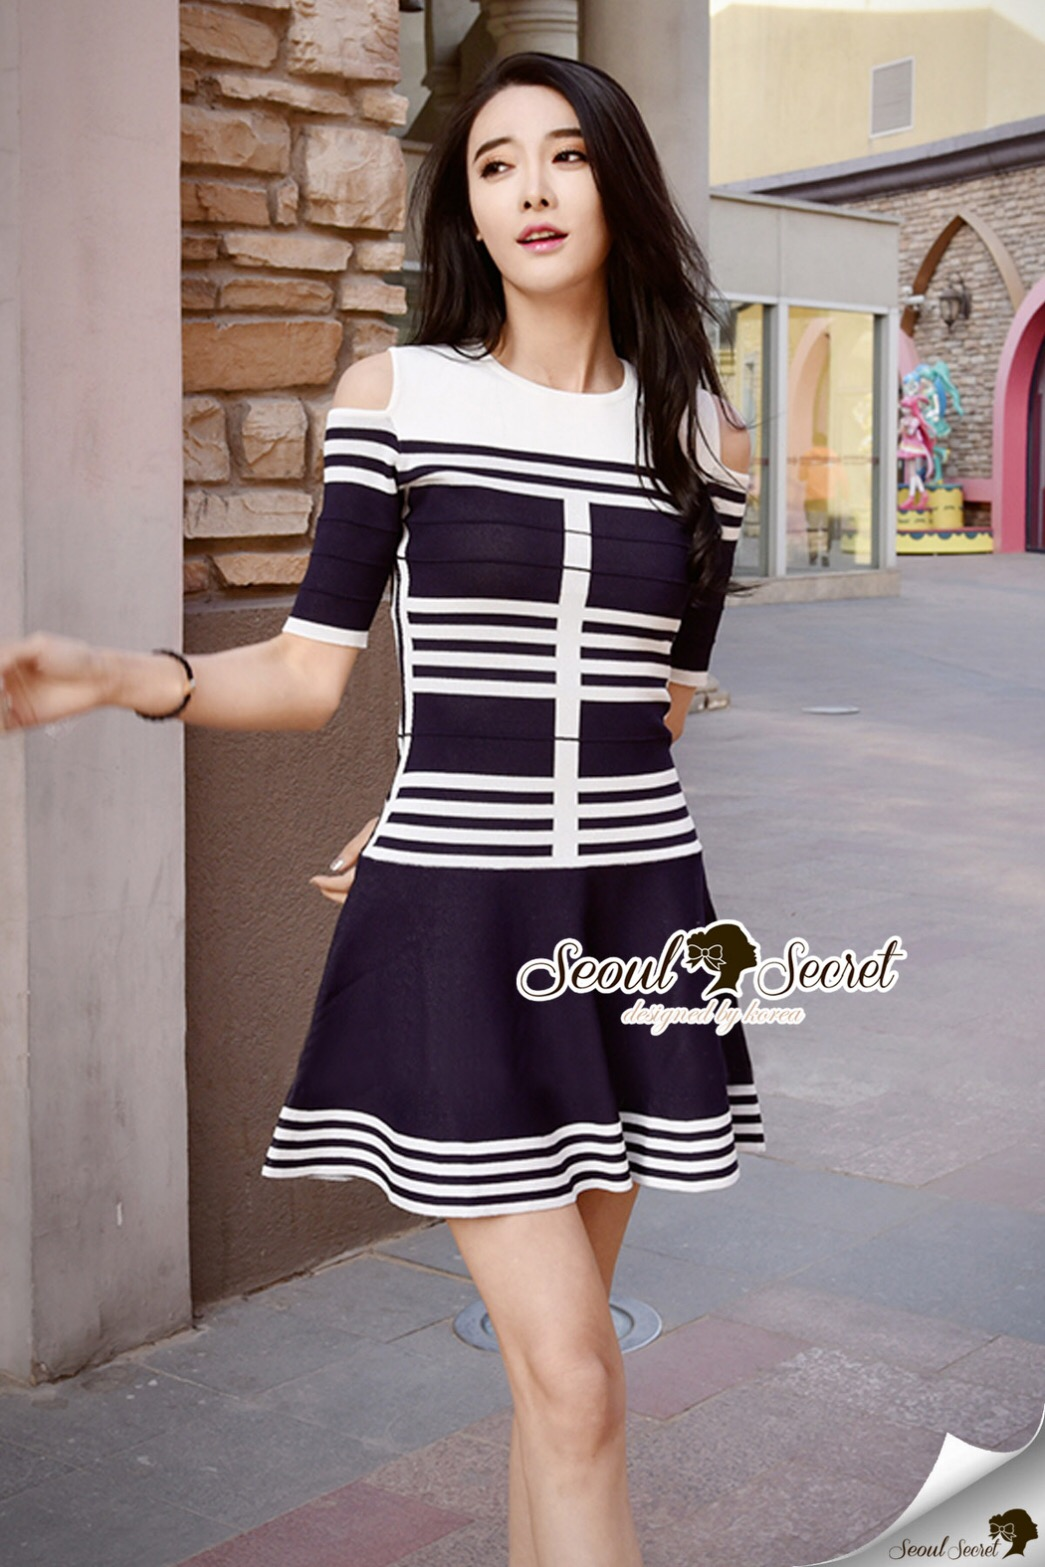 Seoul Secret Say's... Chic Stripy Knitty Dress